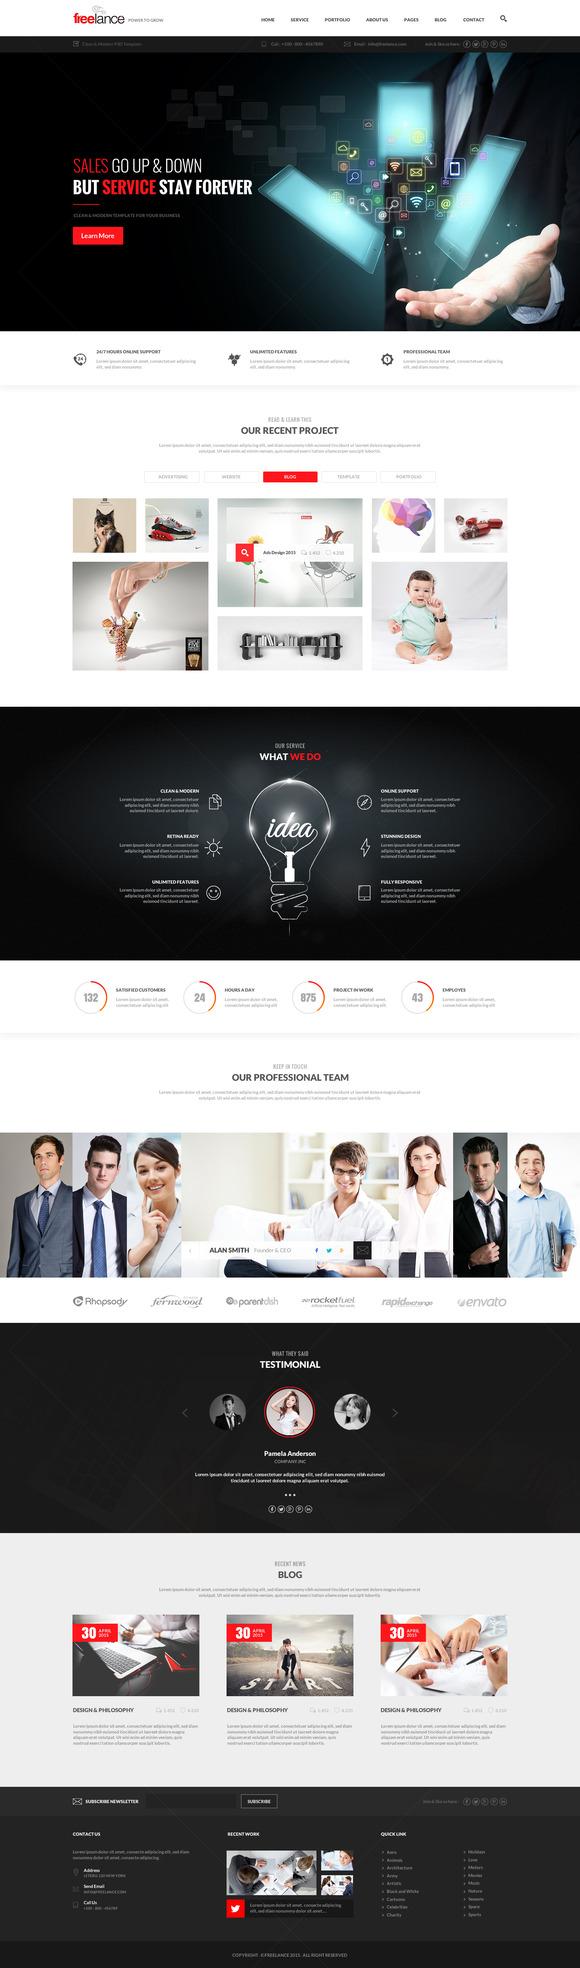 Freelance Business PSD Template